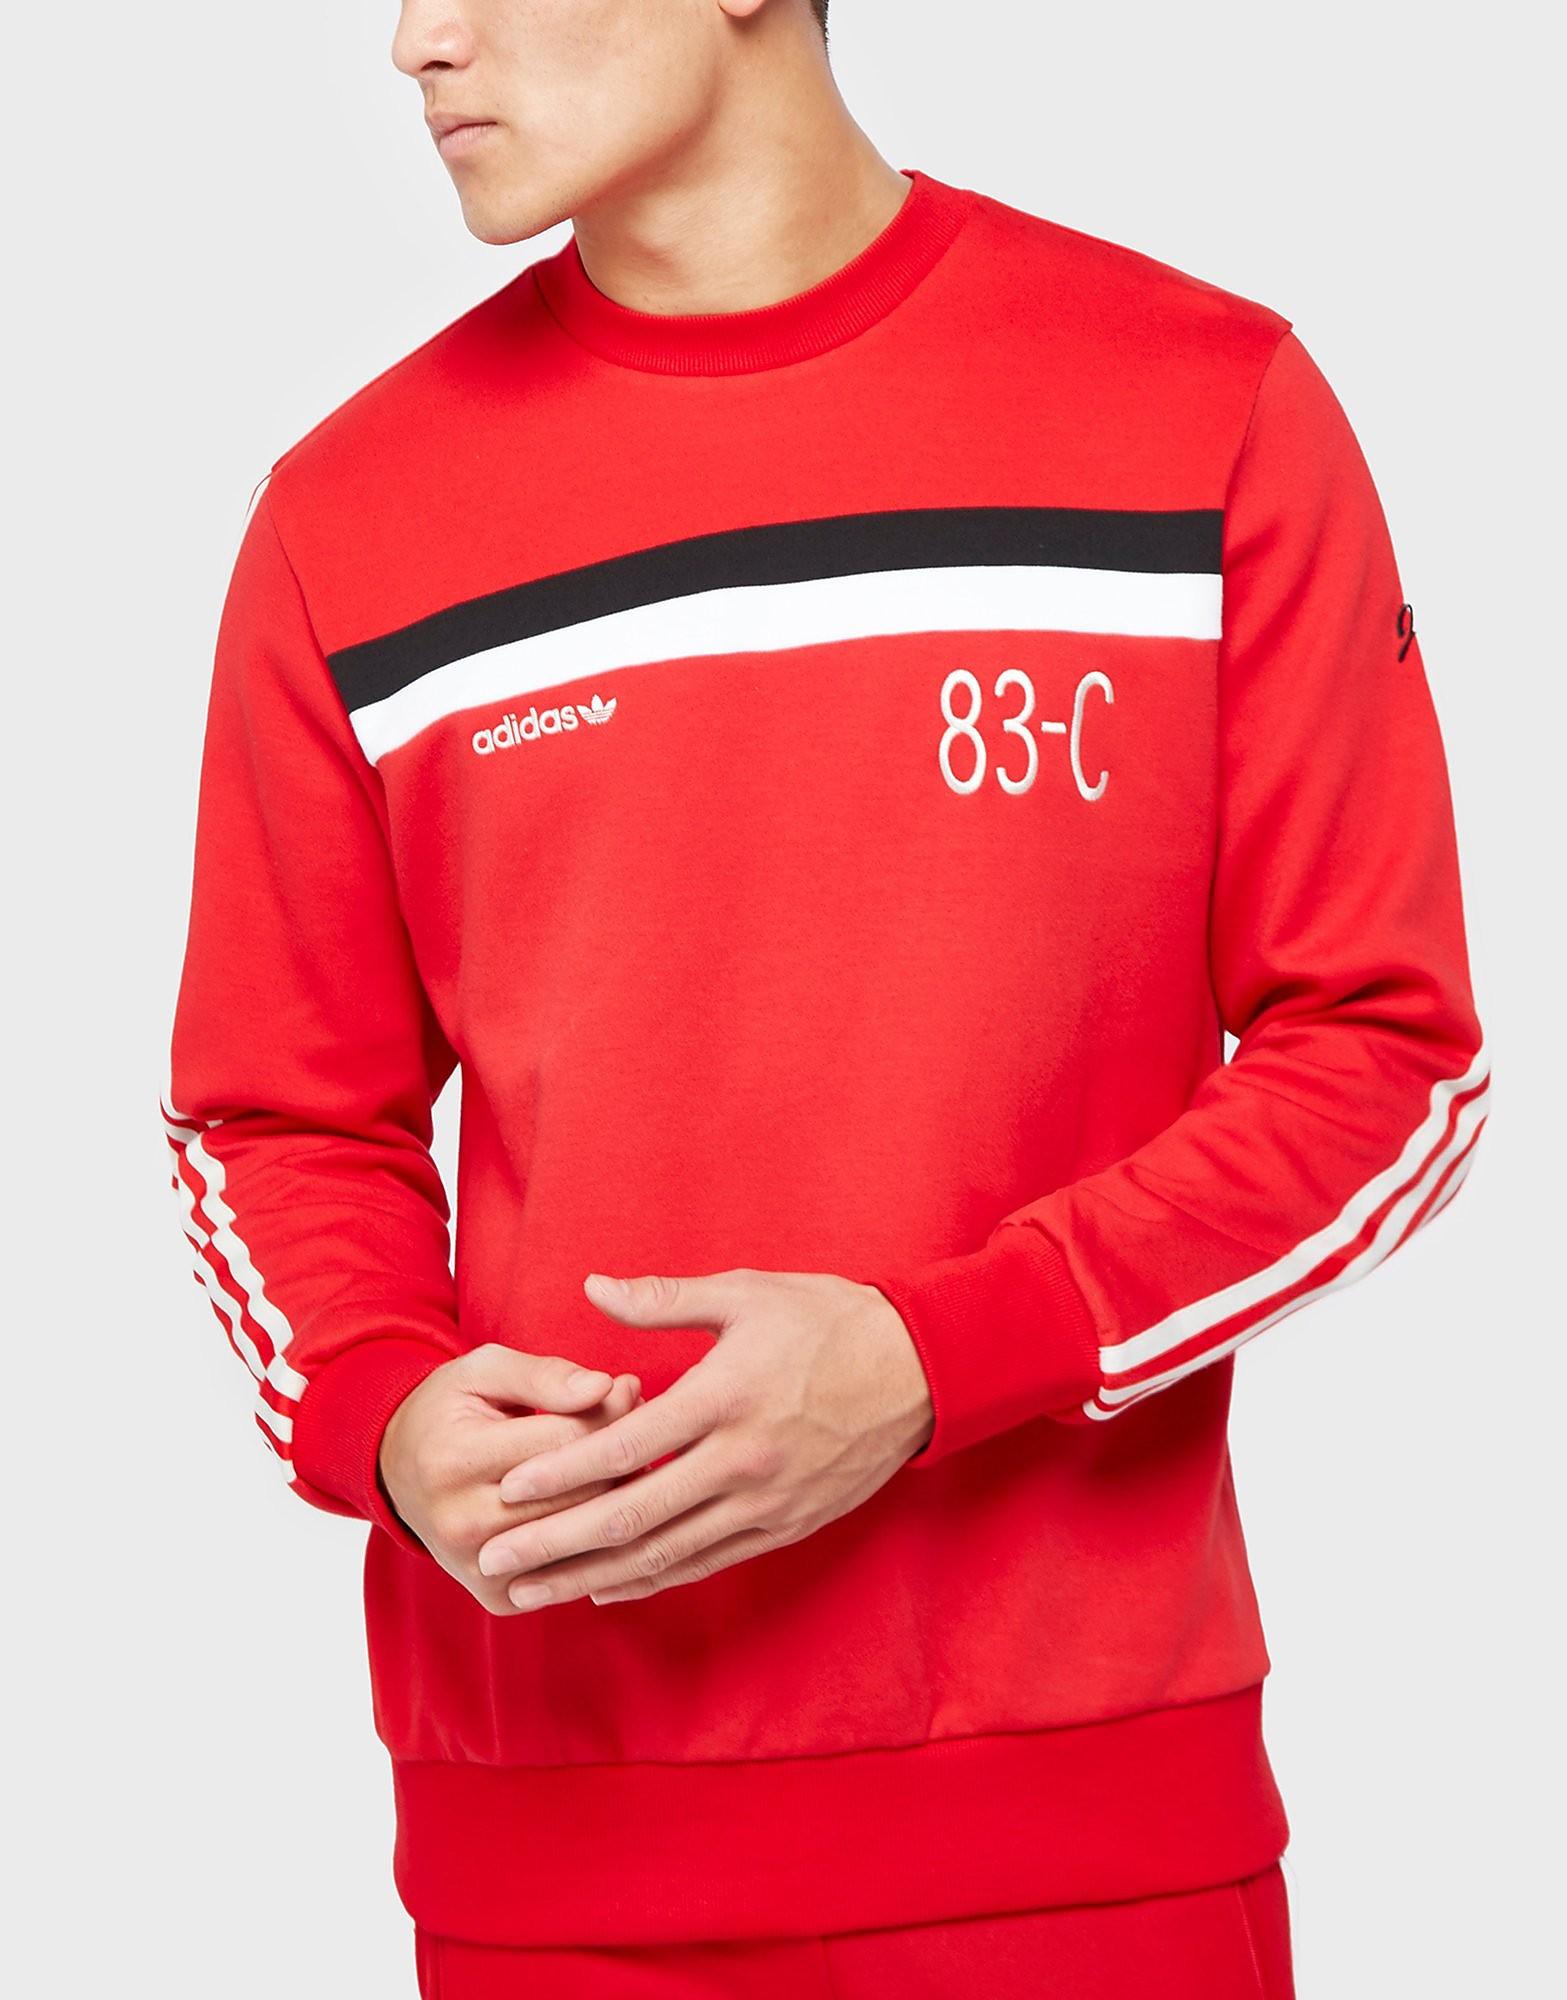 adidas Originals 83-C Crew Sweatshirt